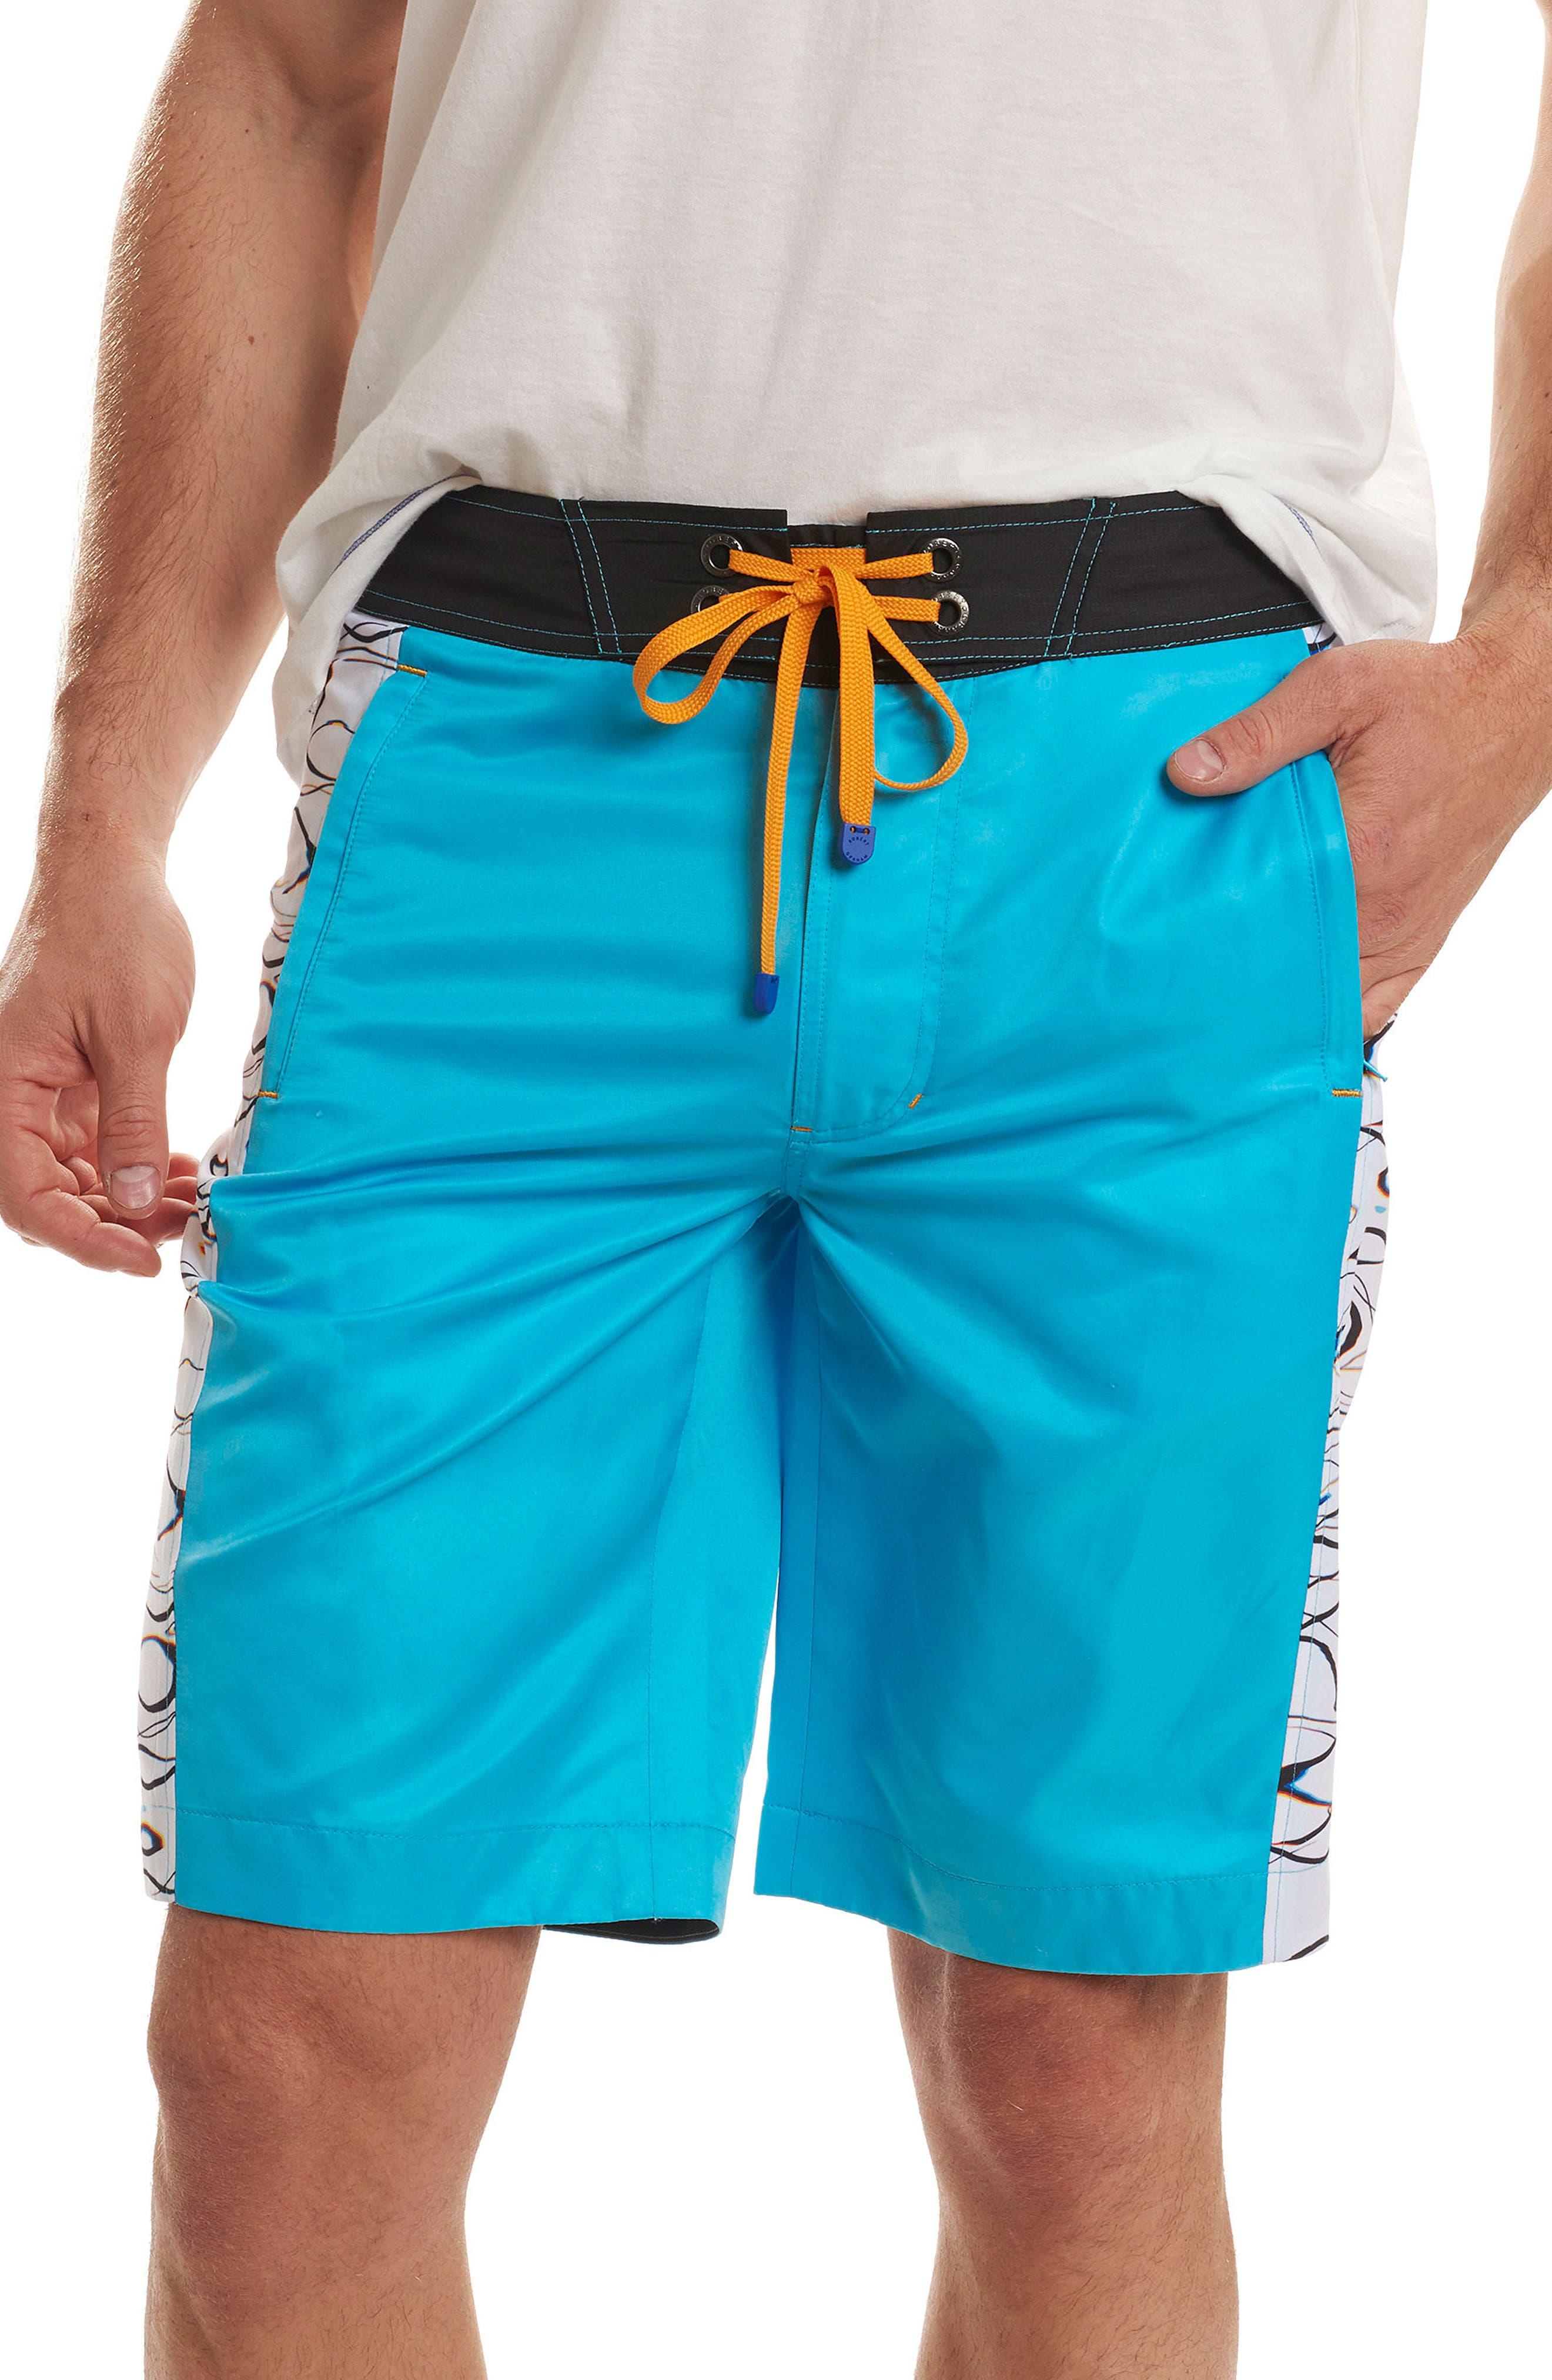 Maili Classic Fit Swim Trunks,                             Main thumbnail 1, color,                             Aqua